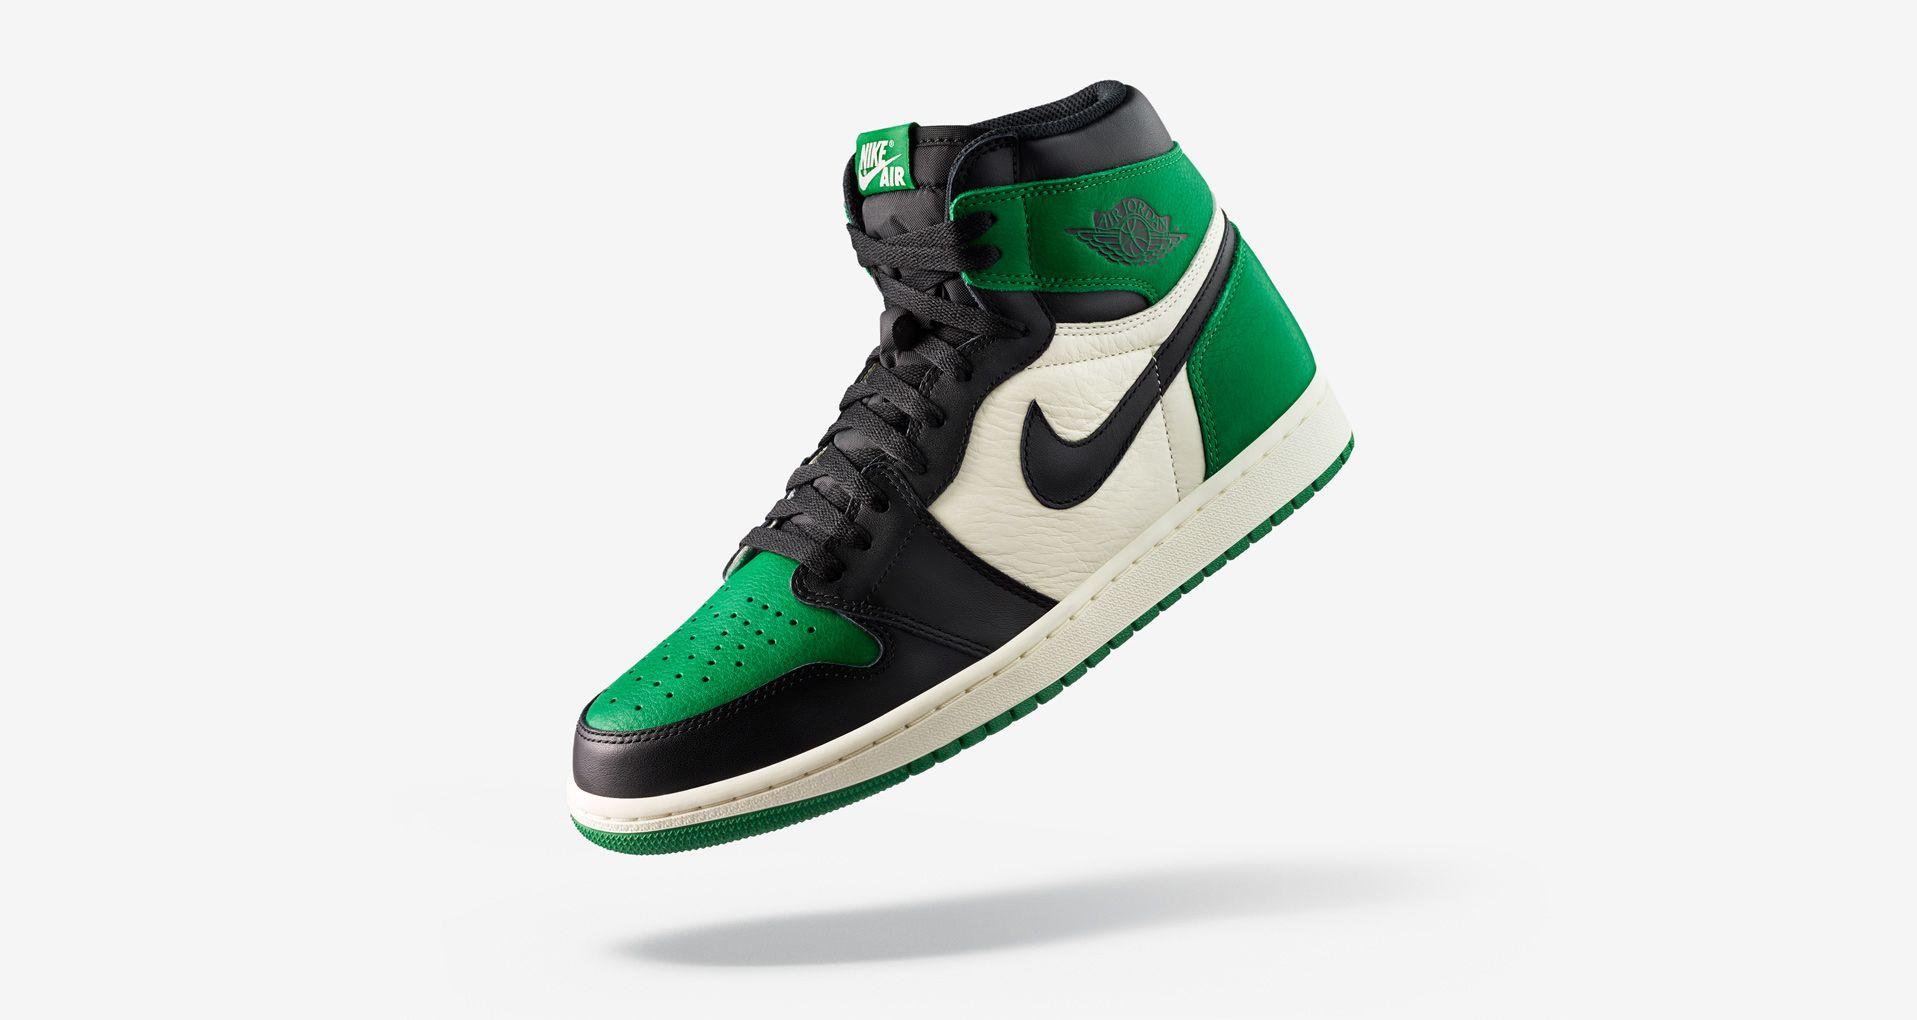 La Green Air 1 Jordan Retro Sortie »Nike De Pine « Date CdBeox